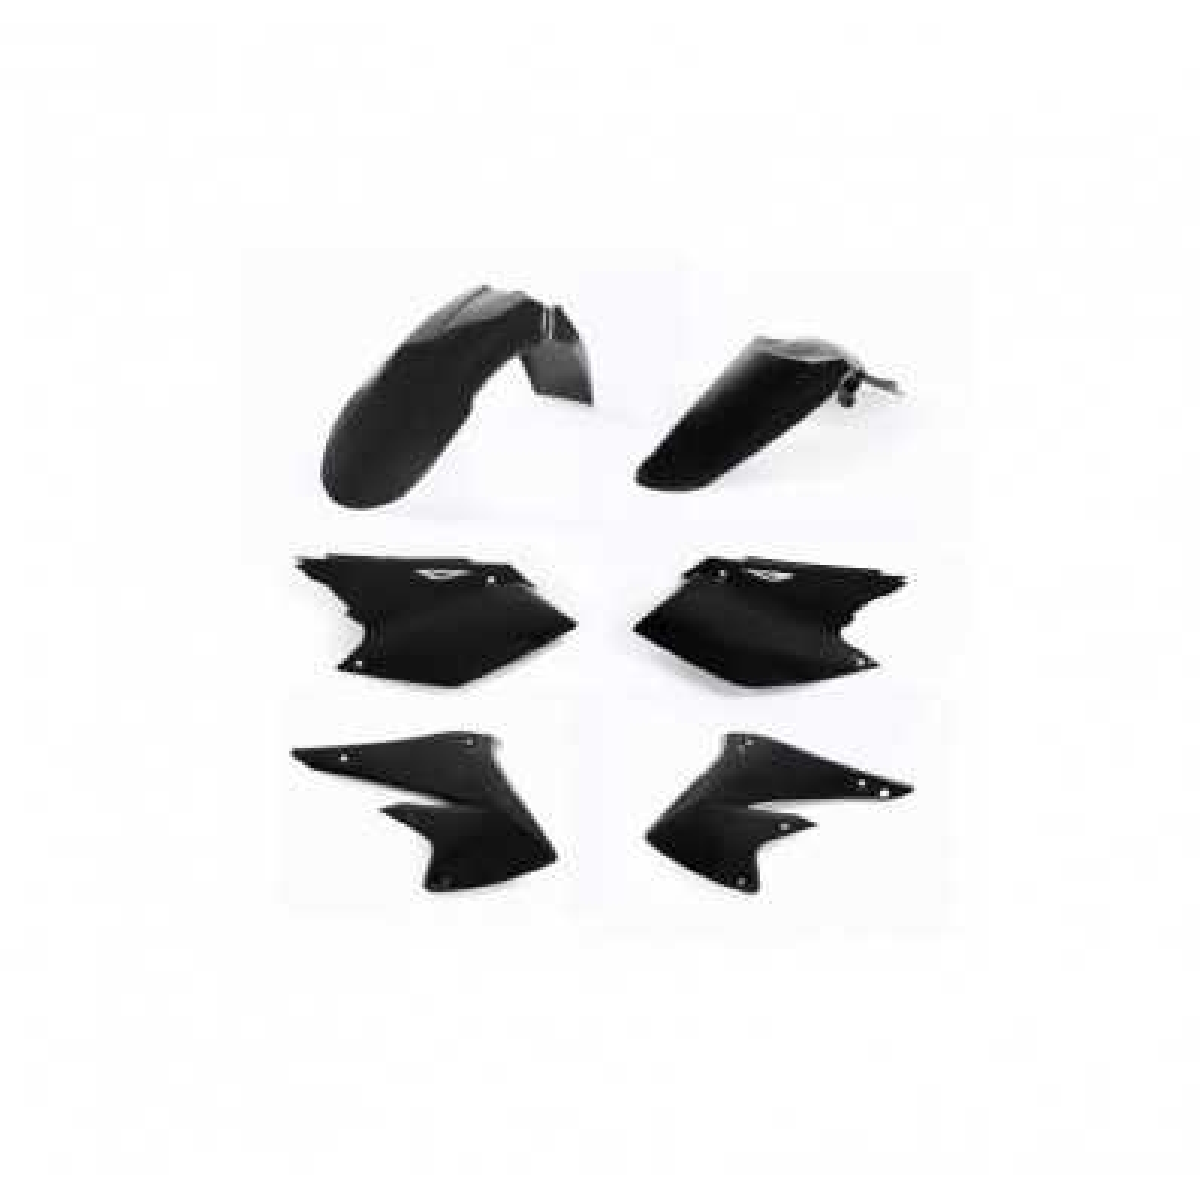 0023055-090 - Kit Plasticos Tc85 18 Negro